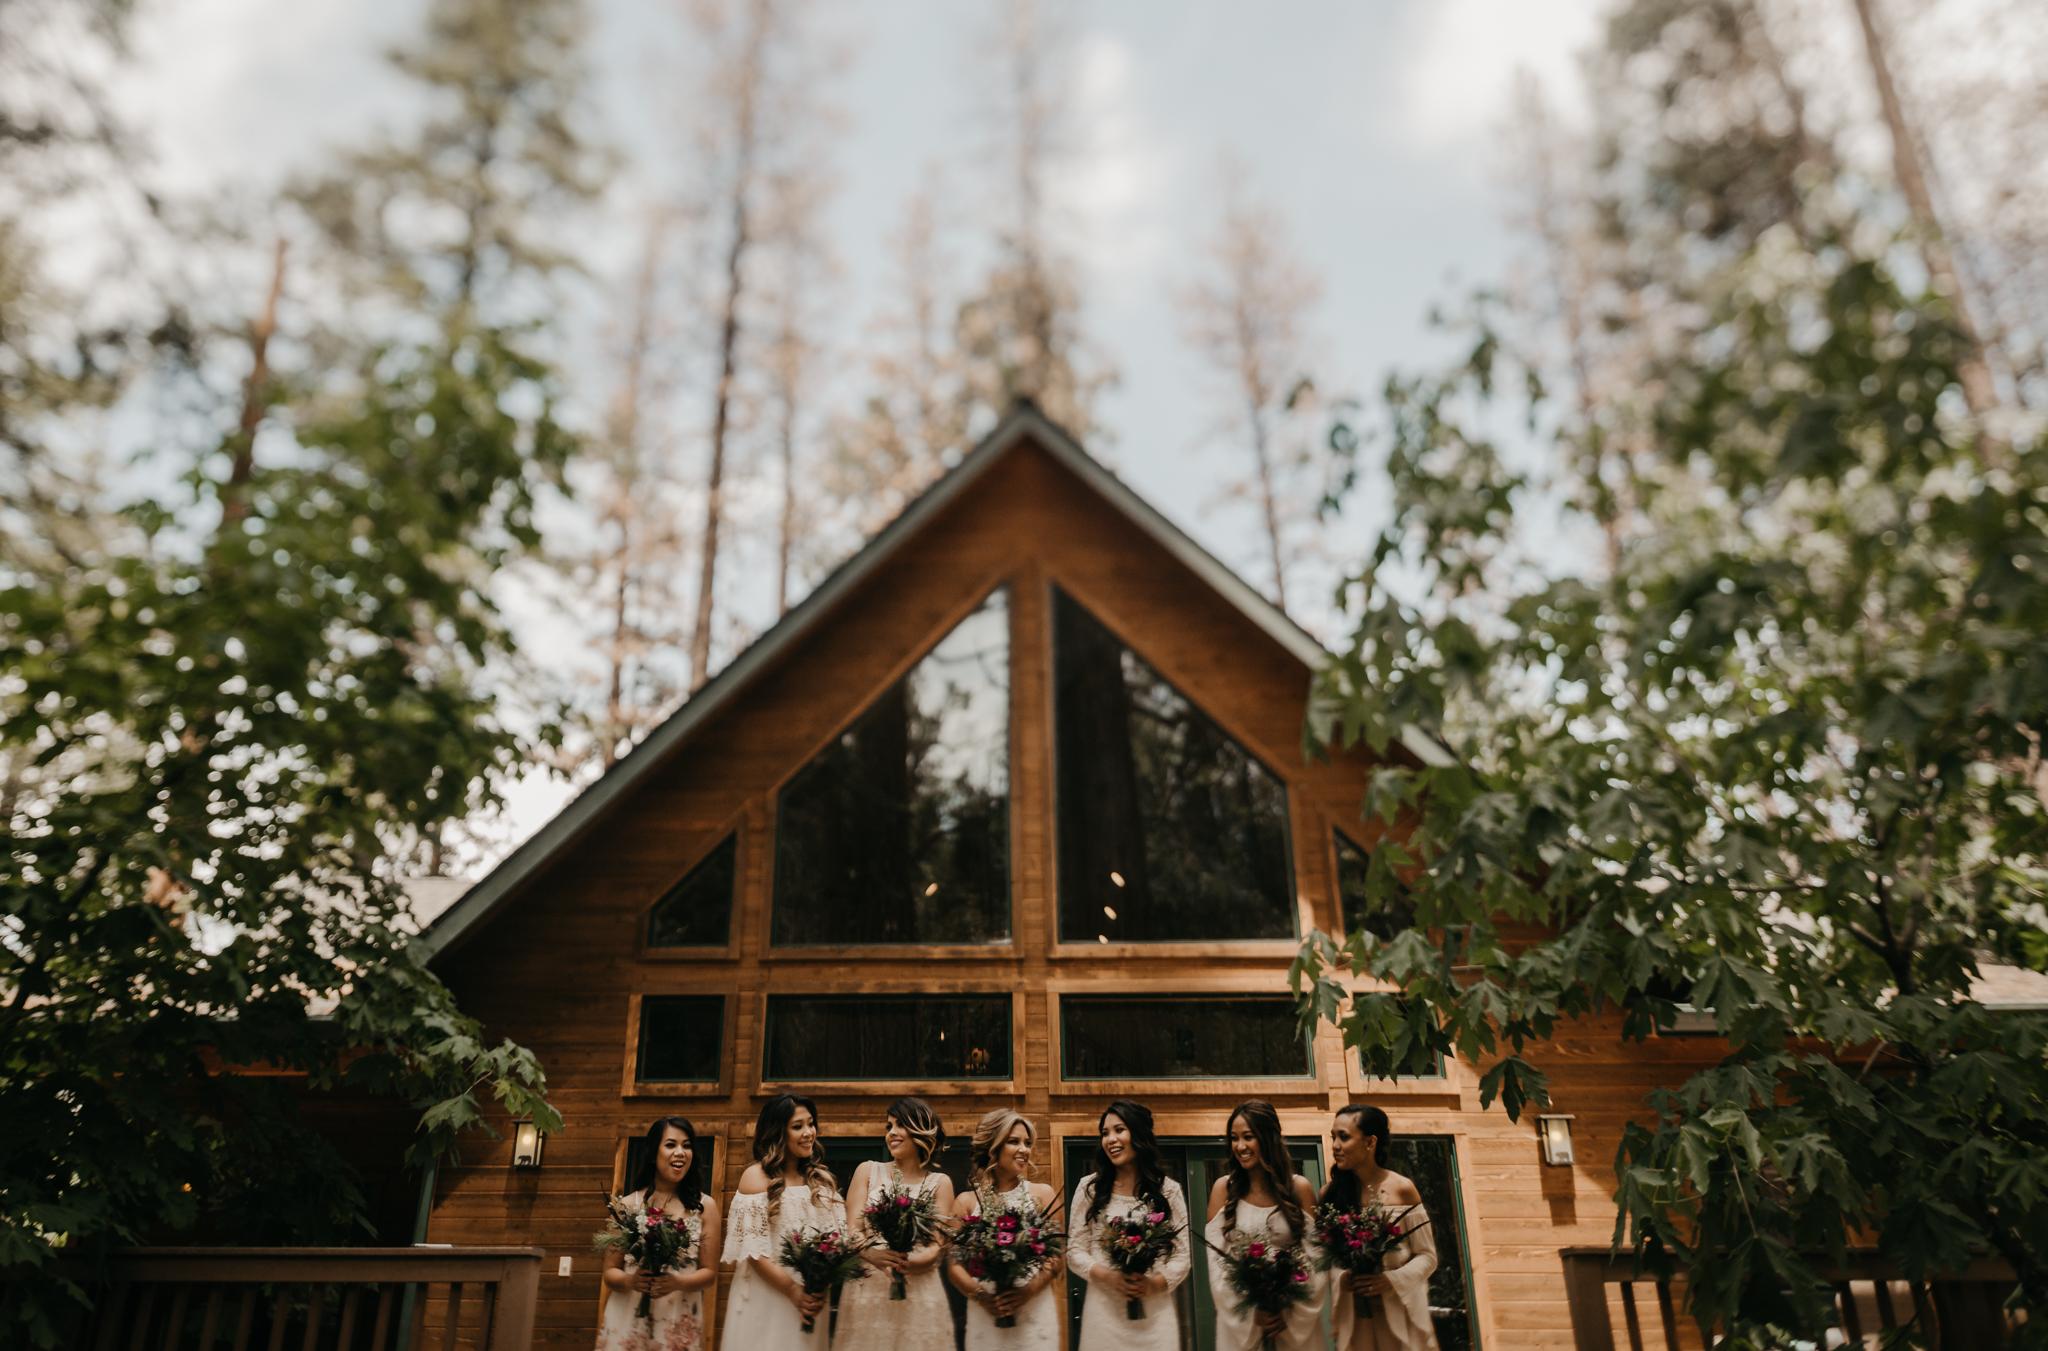 © Isaiah + Taylor Photography - Evergreen Lodge Destination Yoesmite Wedding - Los Angeles Wedding Photographer-056.jpg